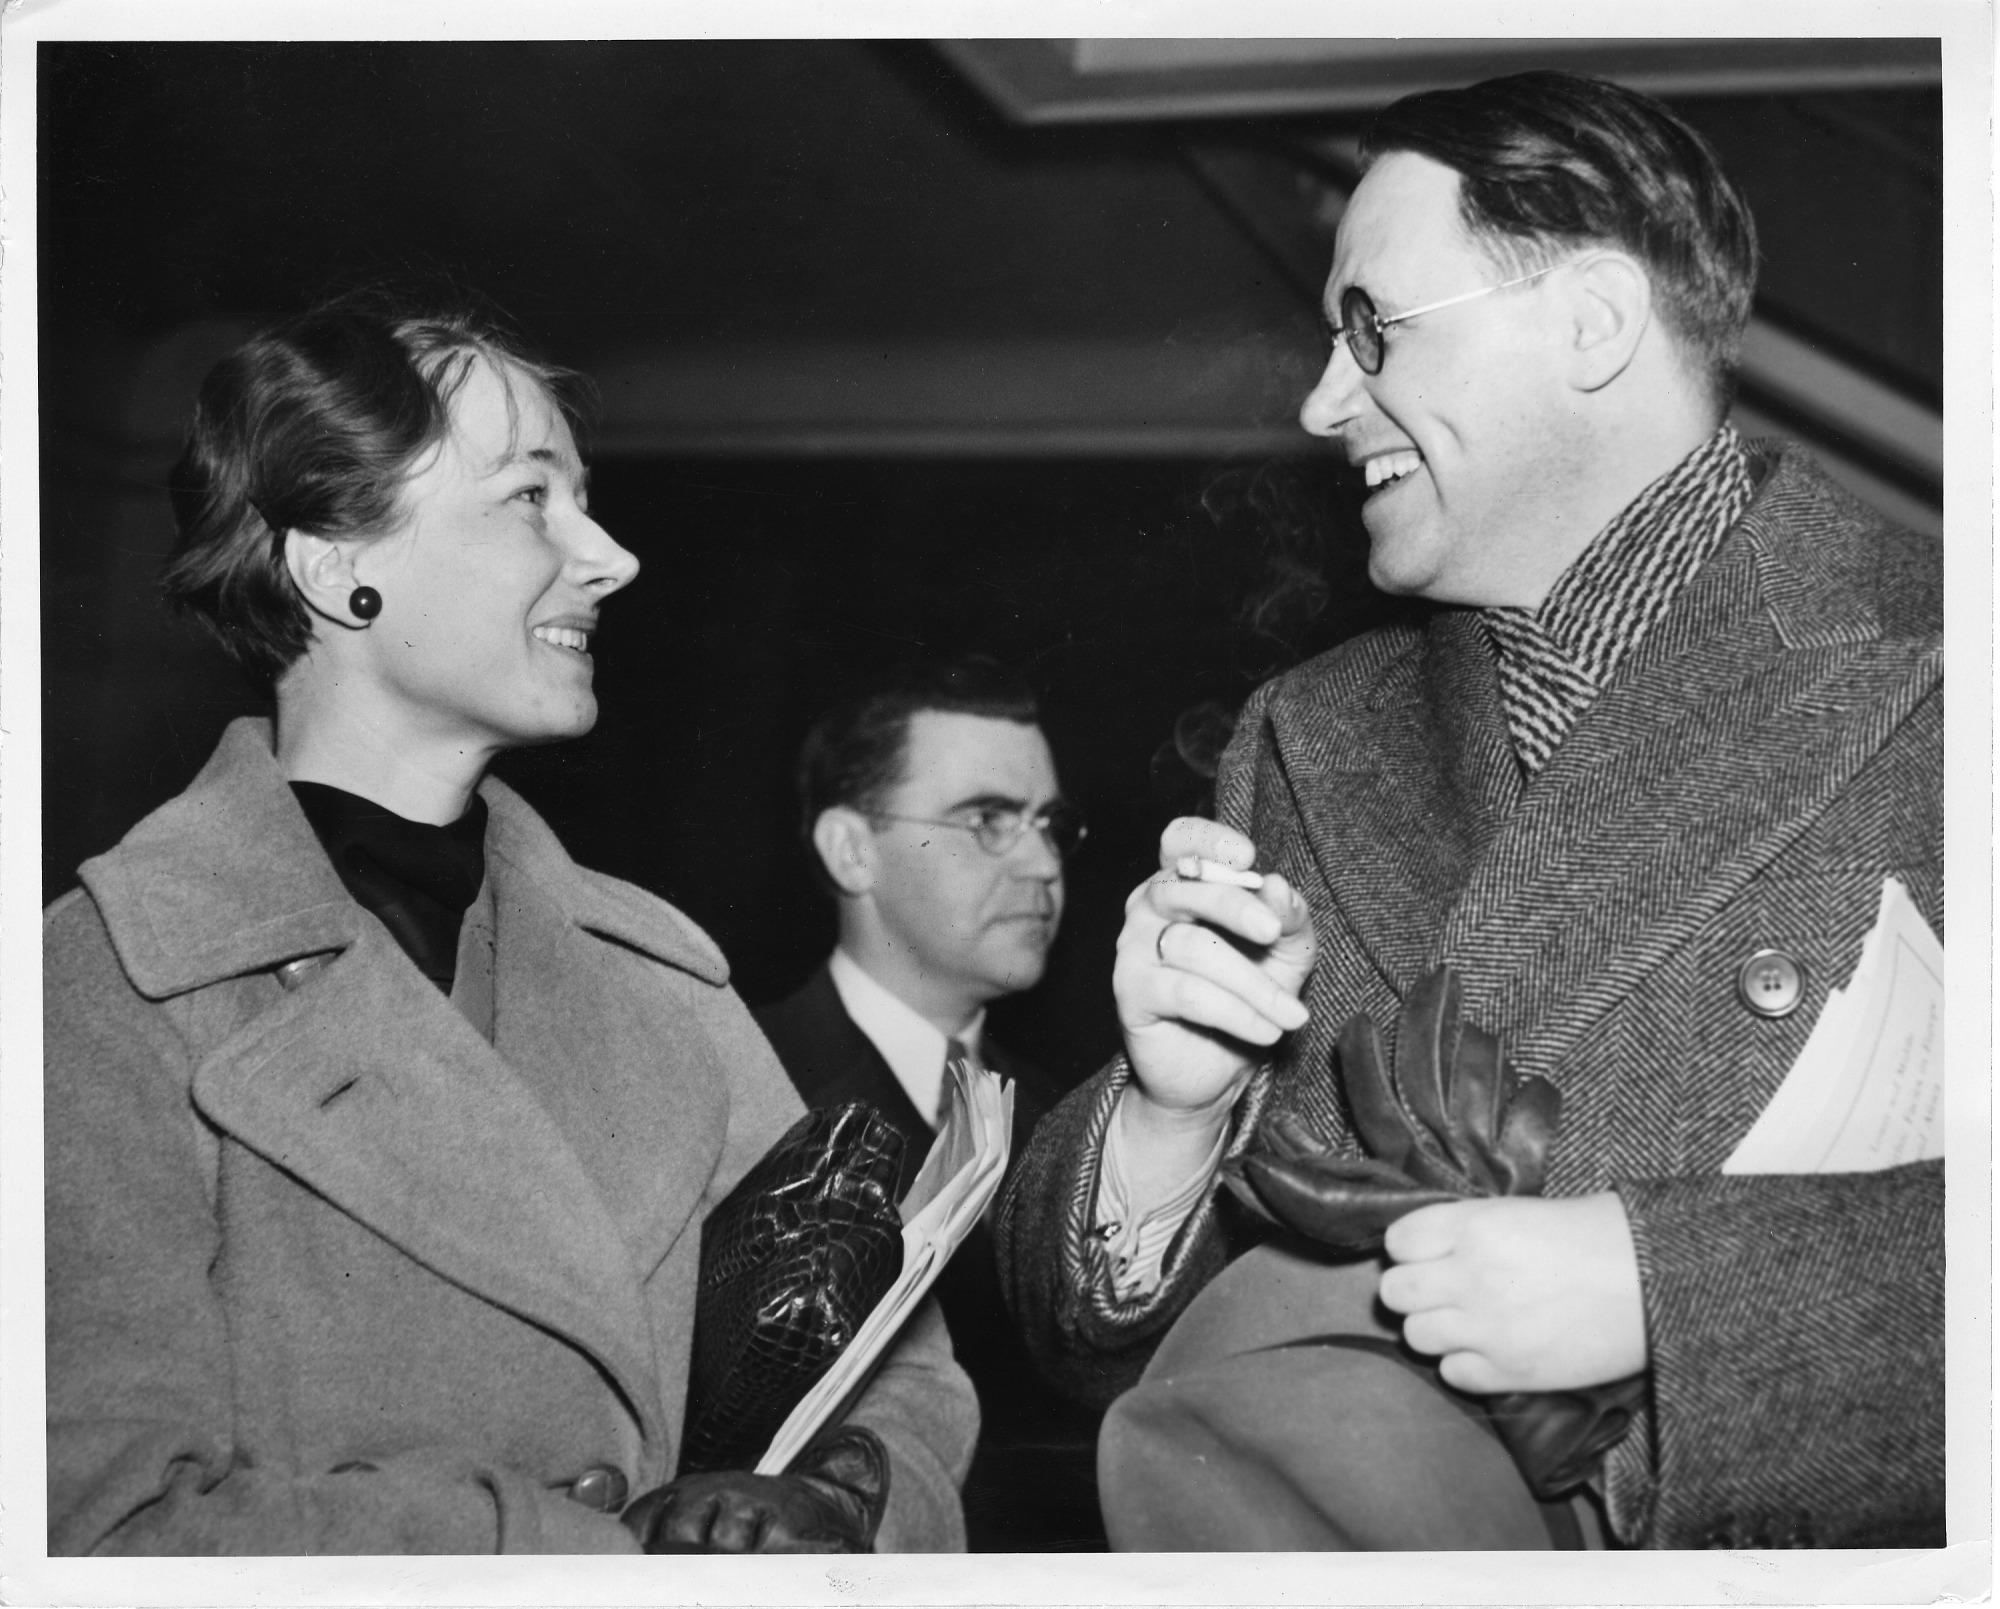 Frederica Annis Lopez de Leo de Laguna (1906-2004), standing and talking at meeting with Kaj Birket-